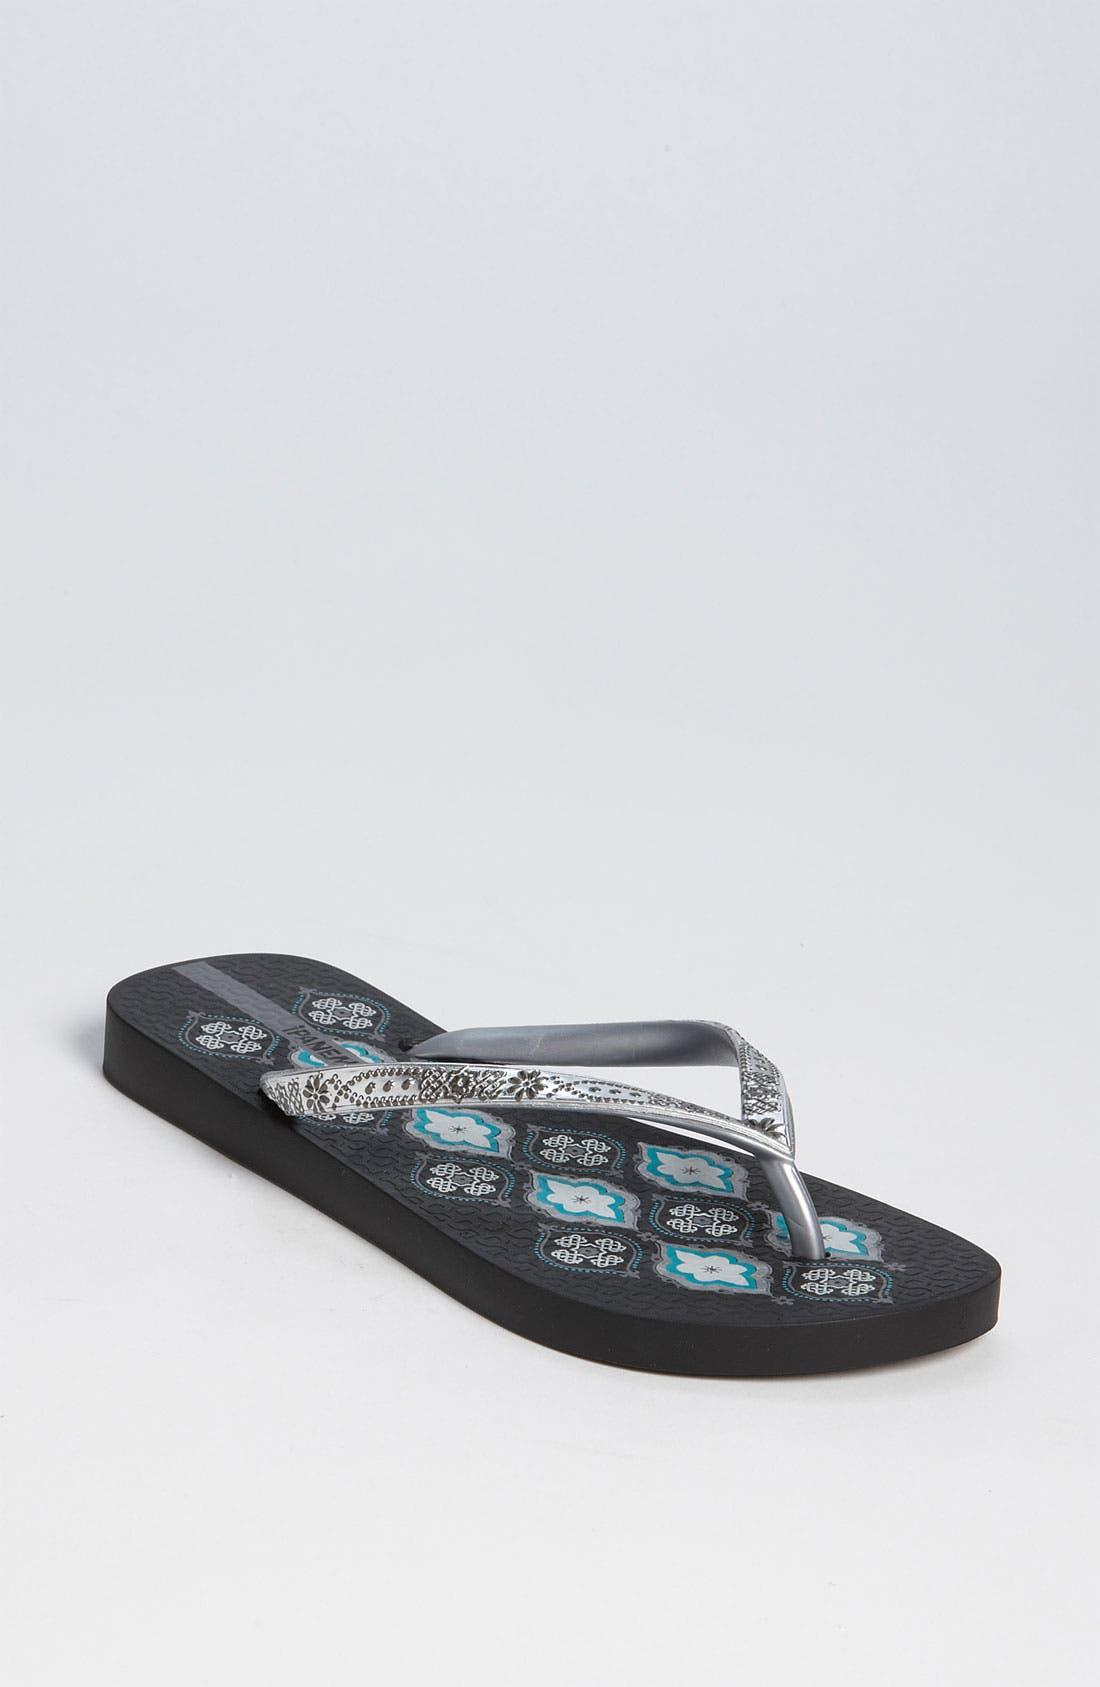 Main Image - Ipanema 'Trends V' Flip Flop